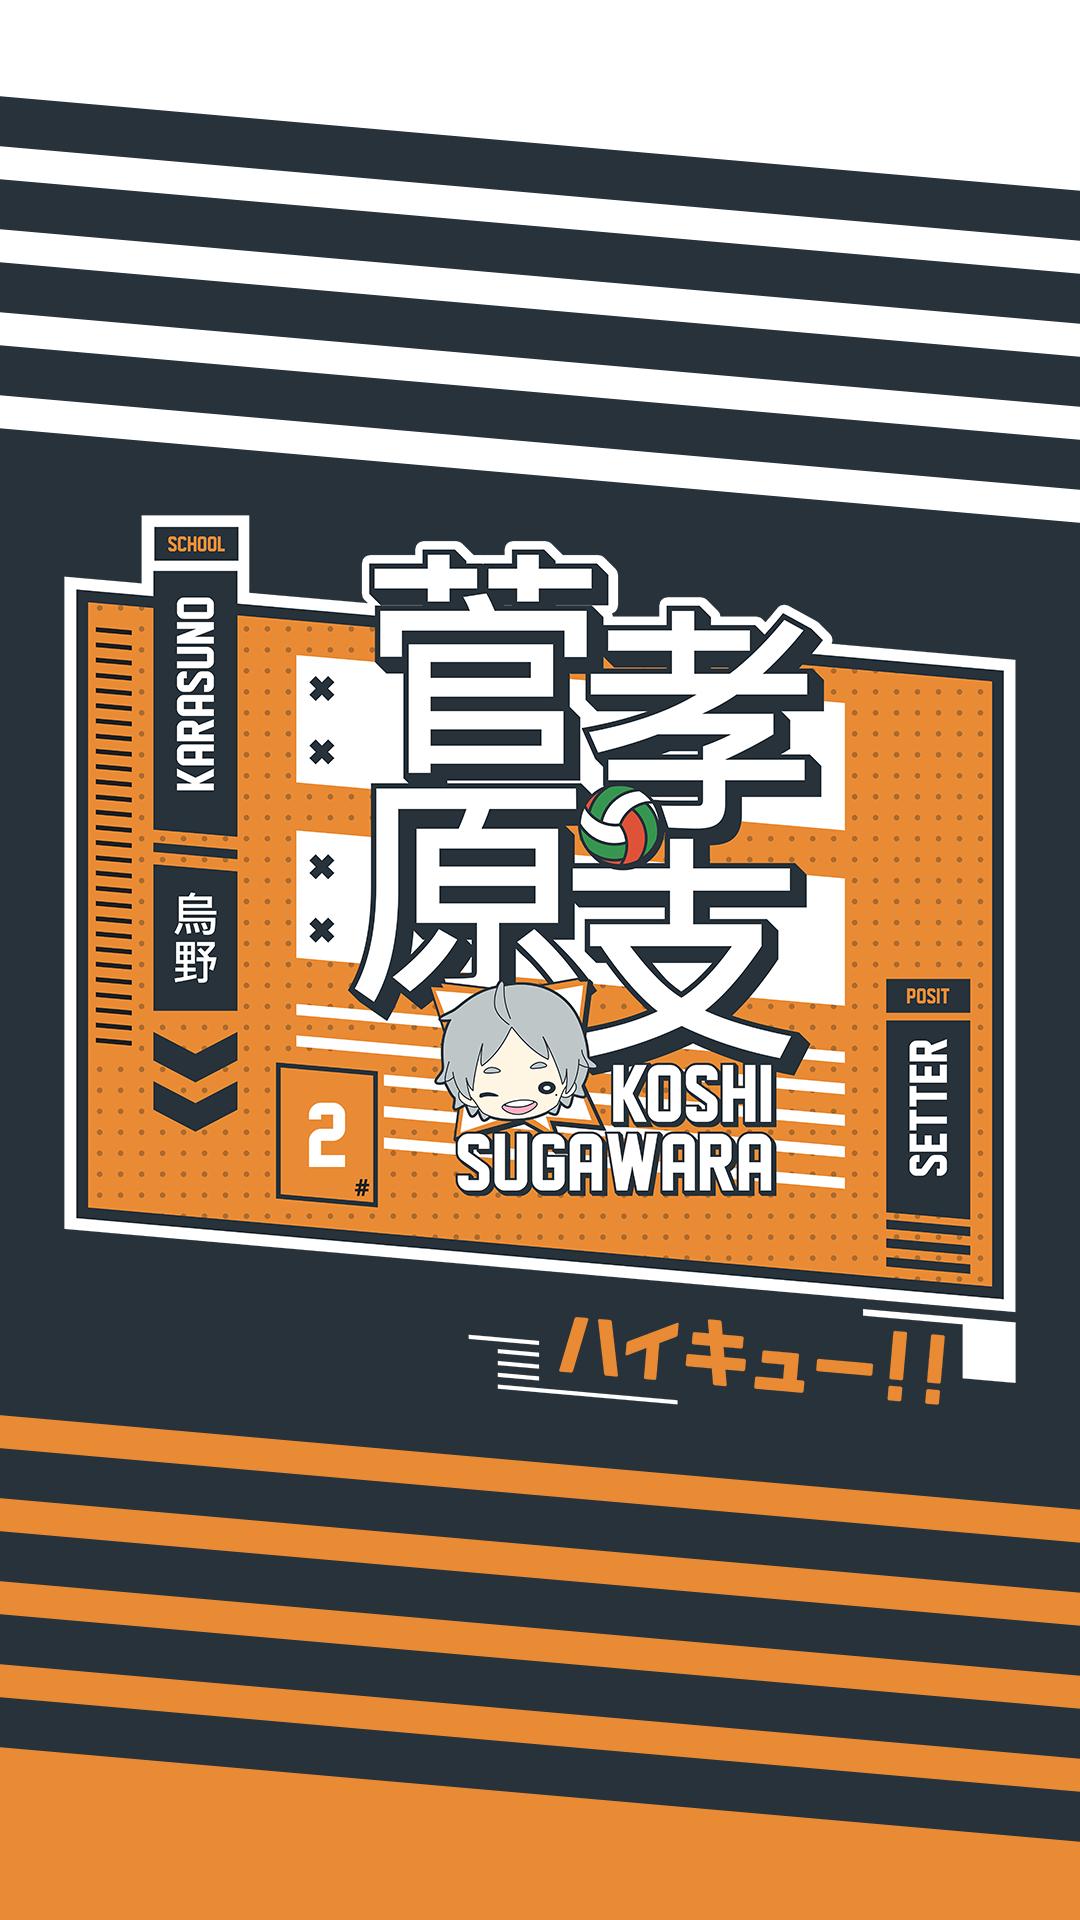 Sugawara Koushi Wallpaper Karasuno In 2020 Haikyuu Wallpaper Haikyuu Fanart Anime Cover Photo